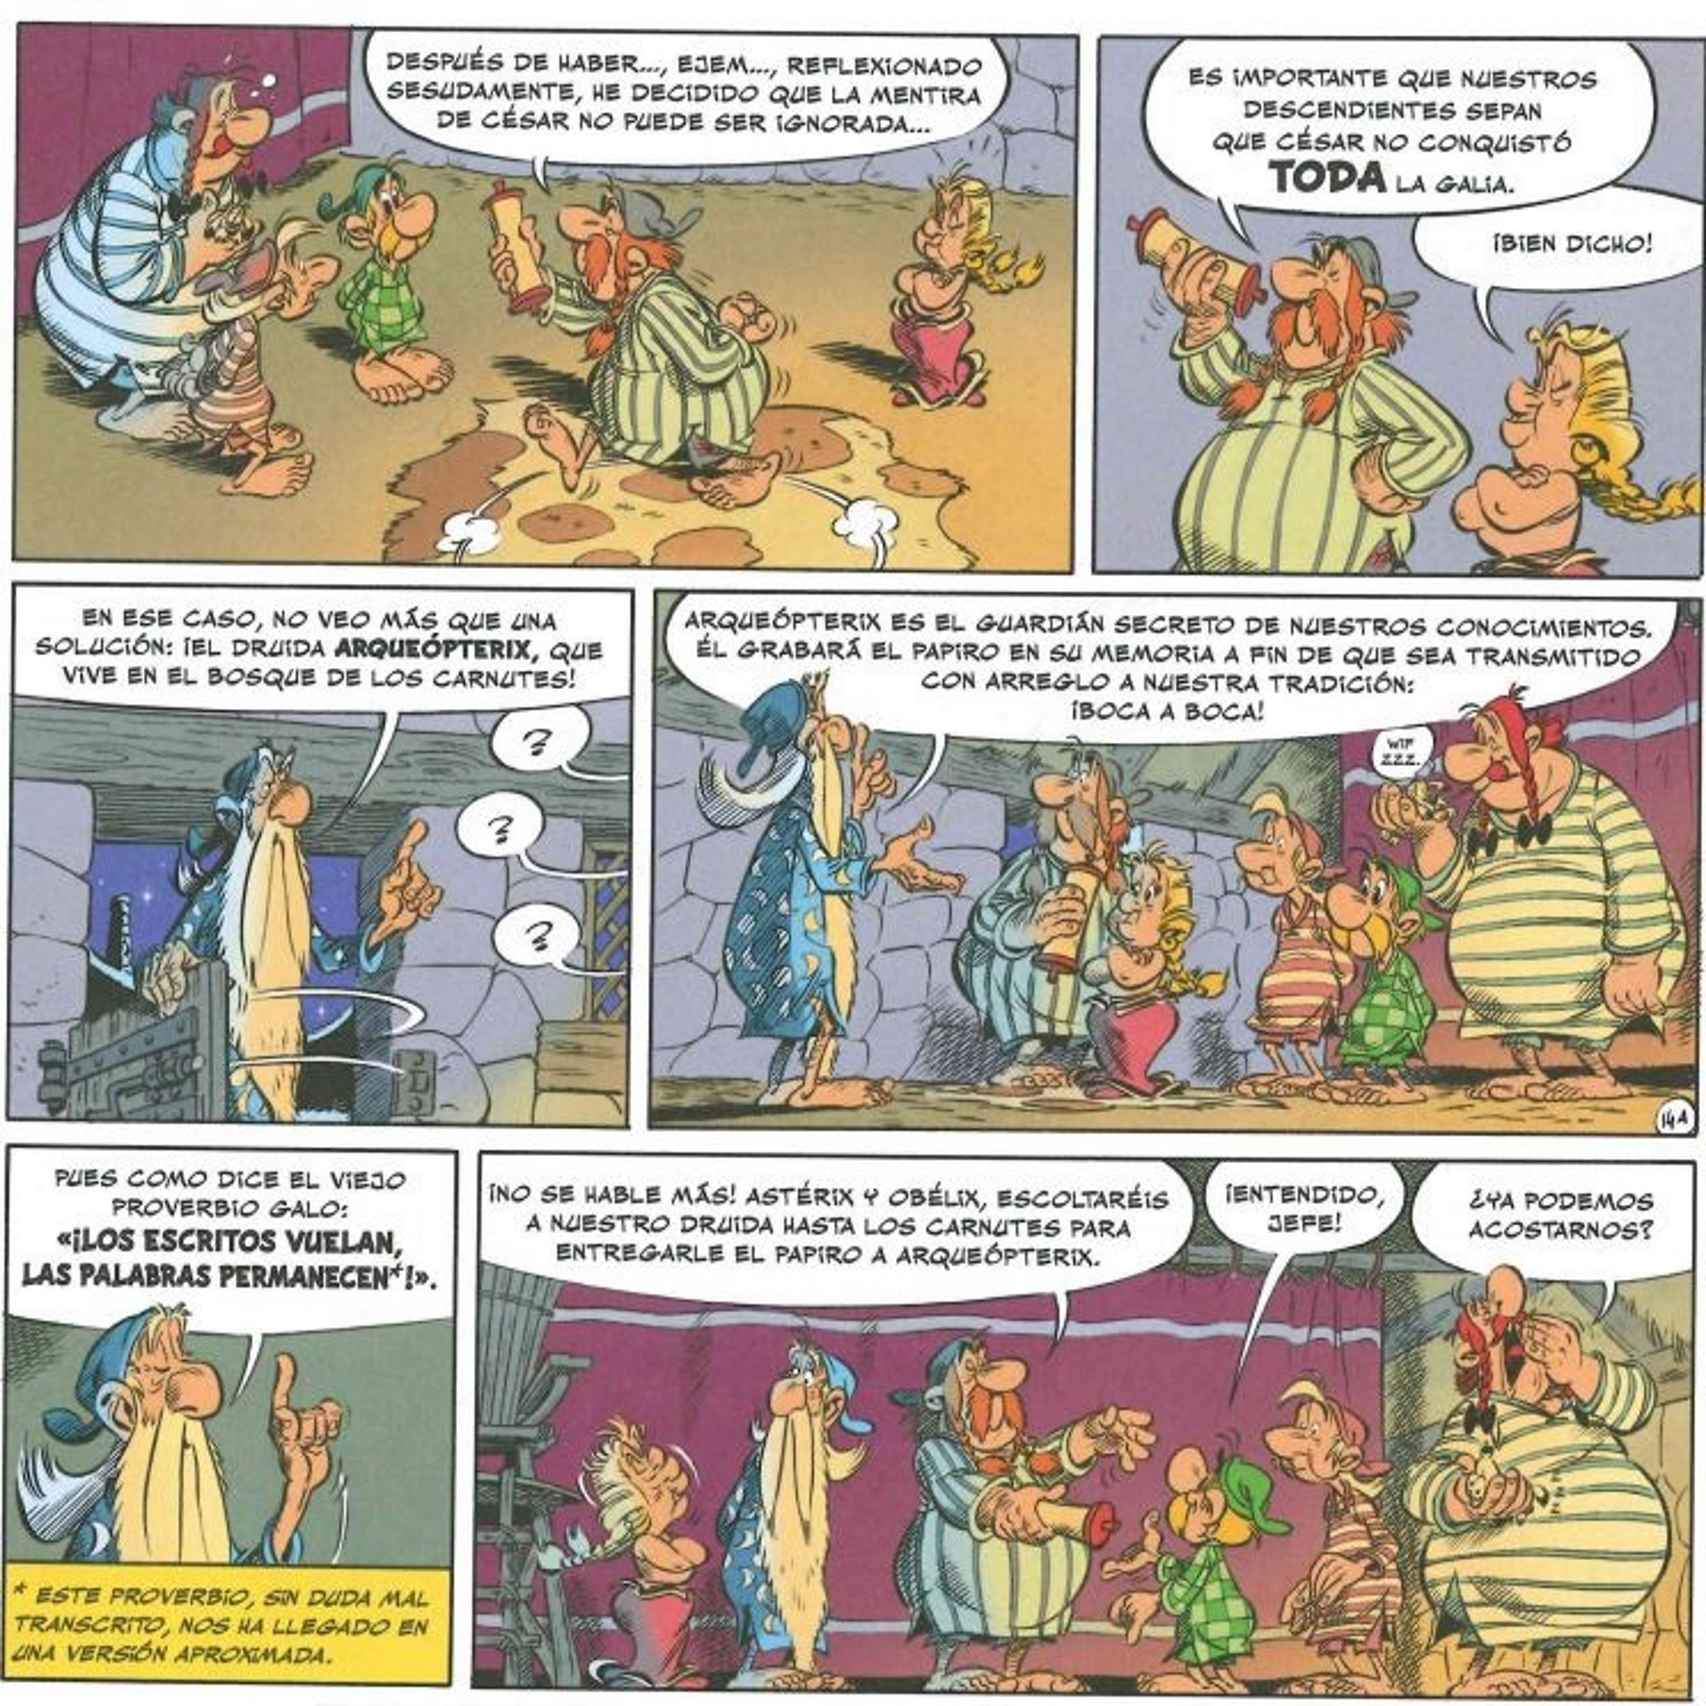 Astérix busca preservar la verdad. / SALVAT